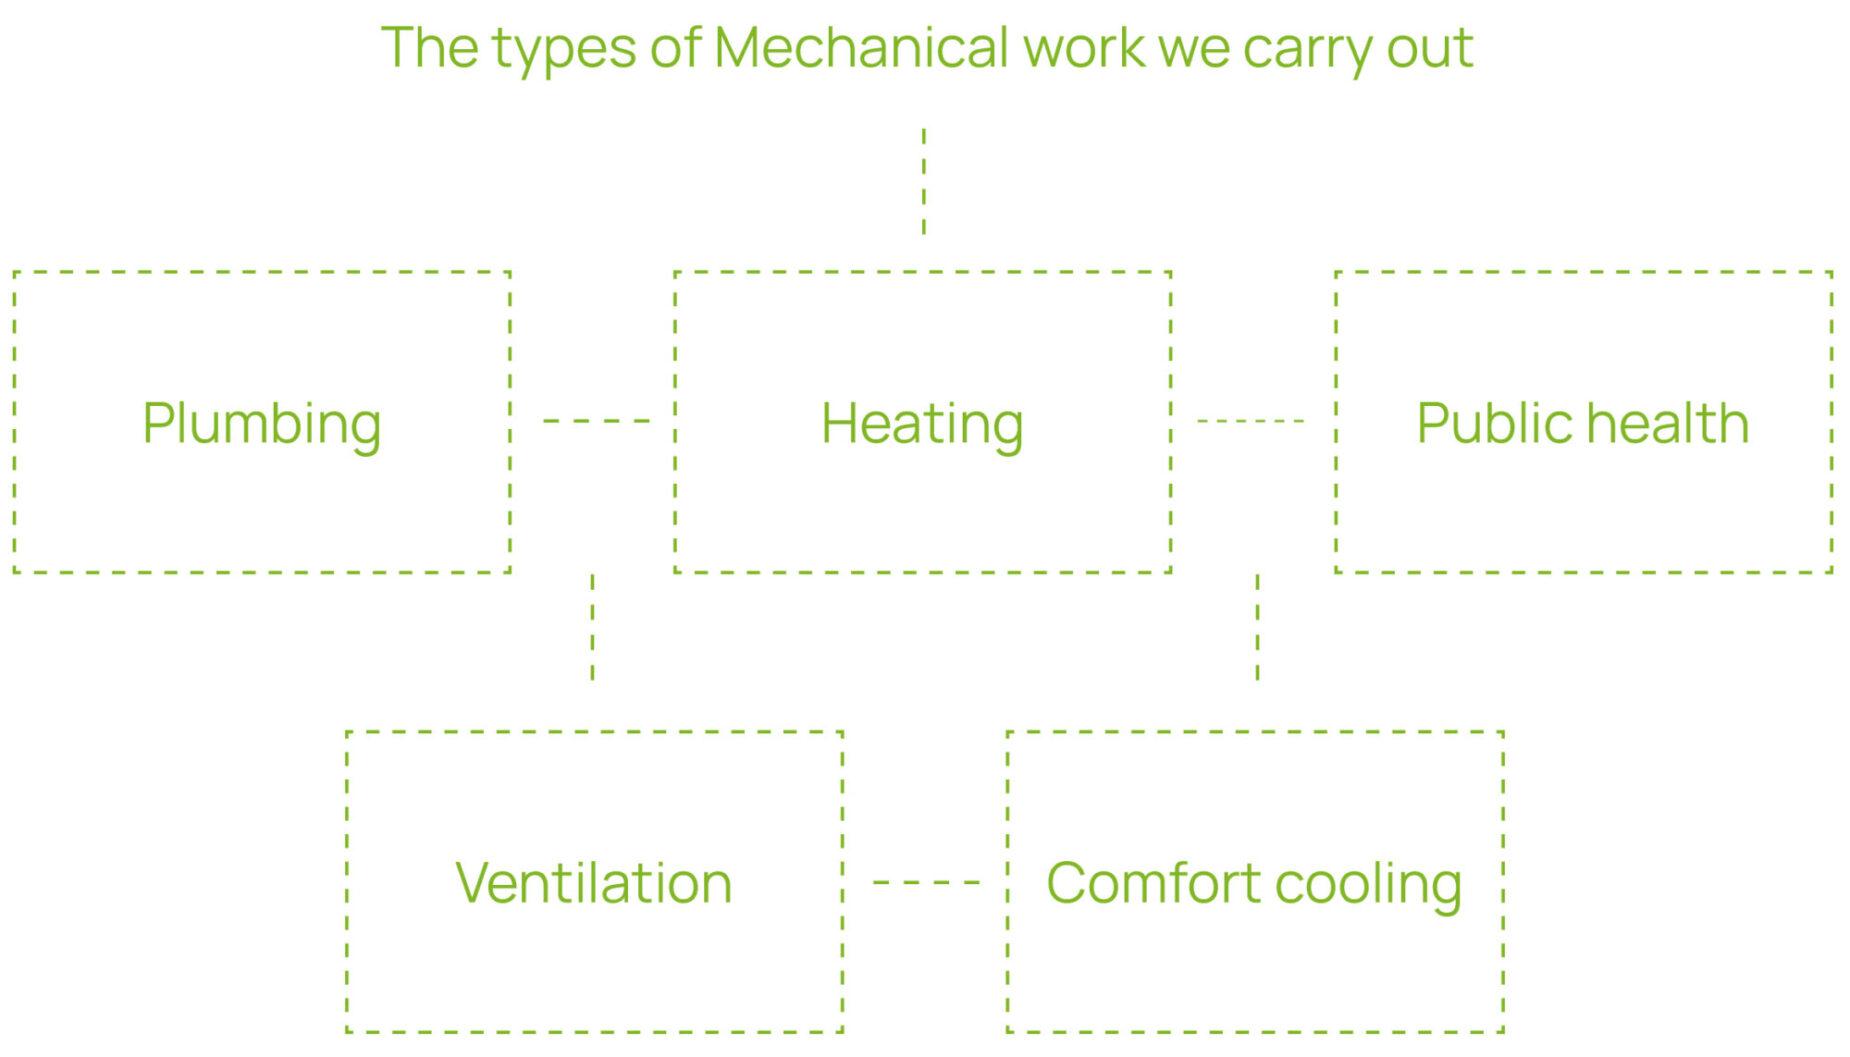 CES Mechanical work